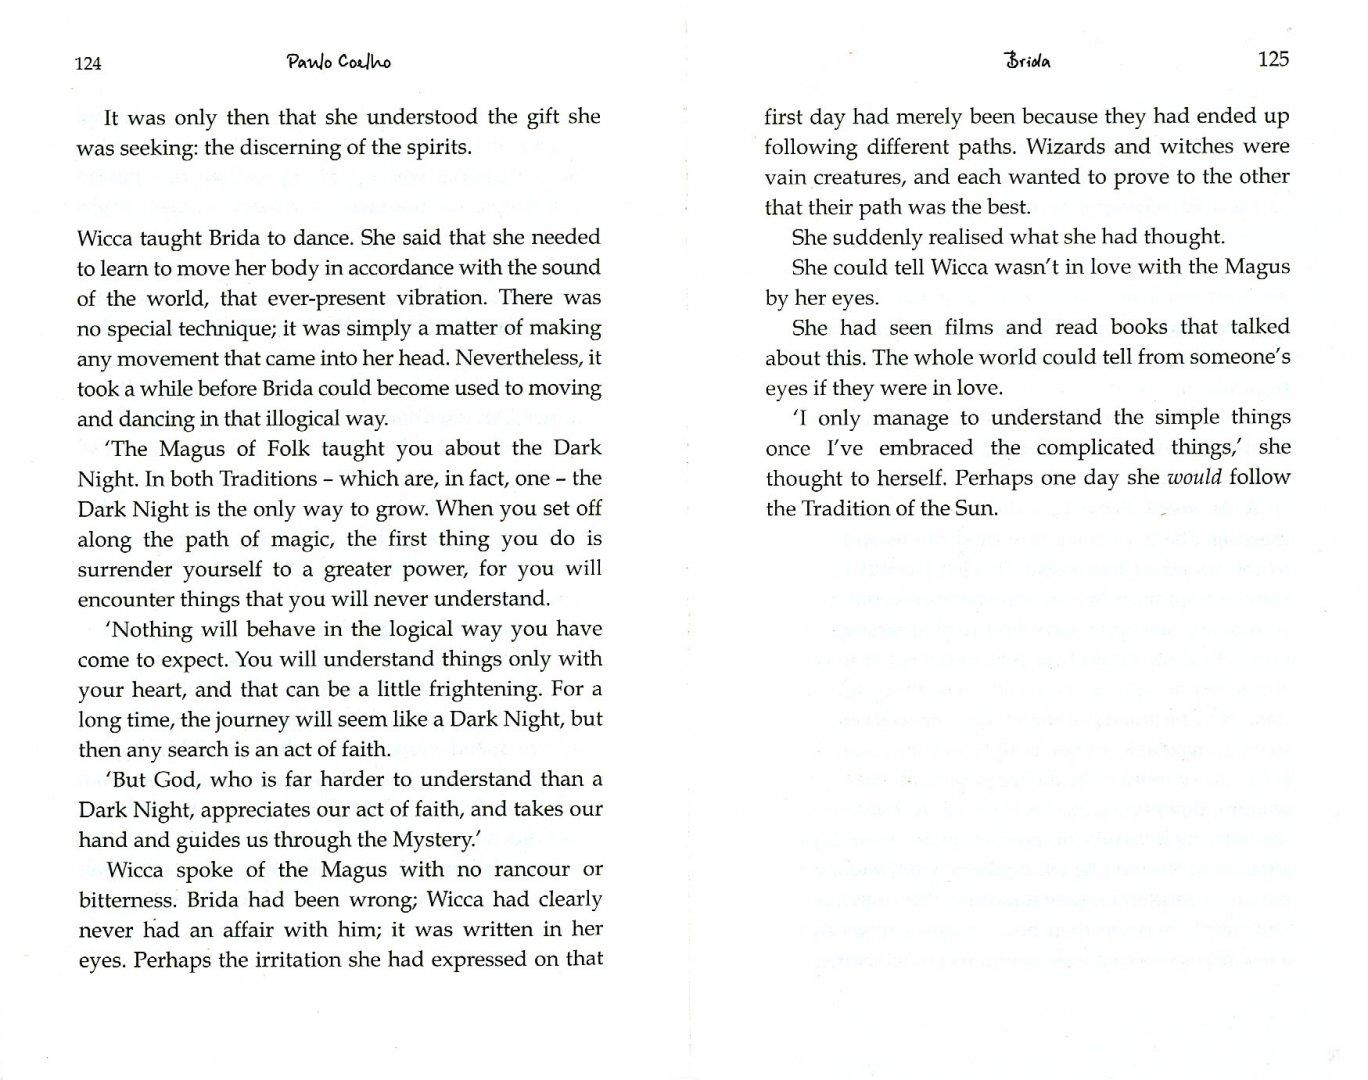 Иллюстрация 1 из 9 для Brida - Paulo Coelho | Лабиринт - книги. Источник: Лабиринт